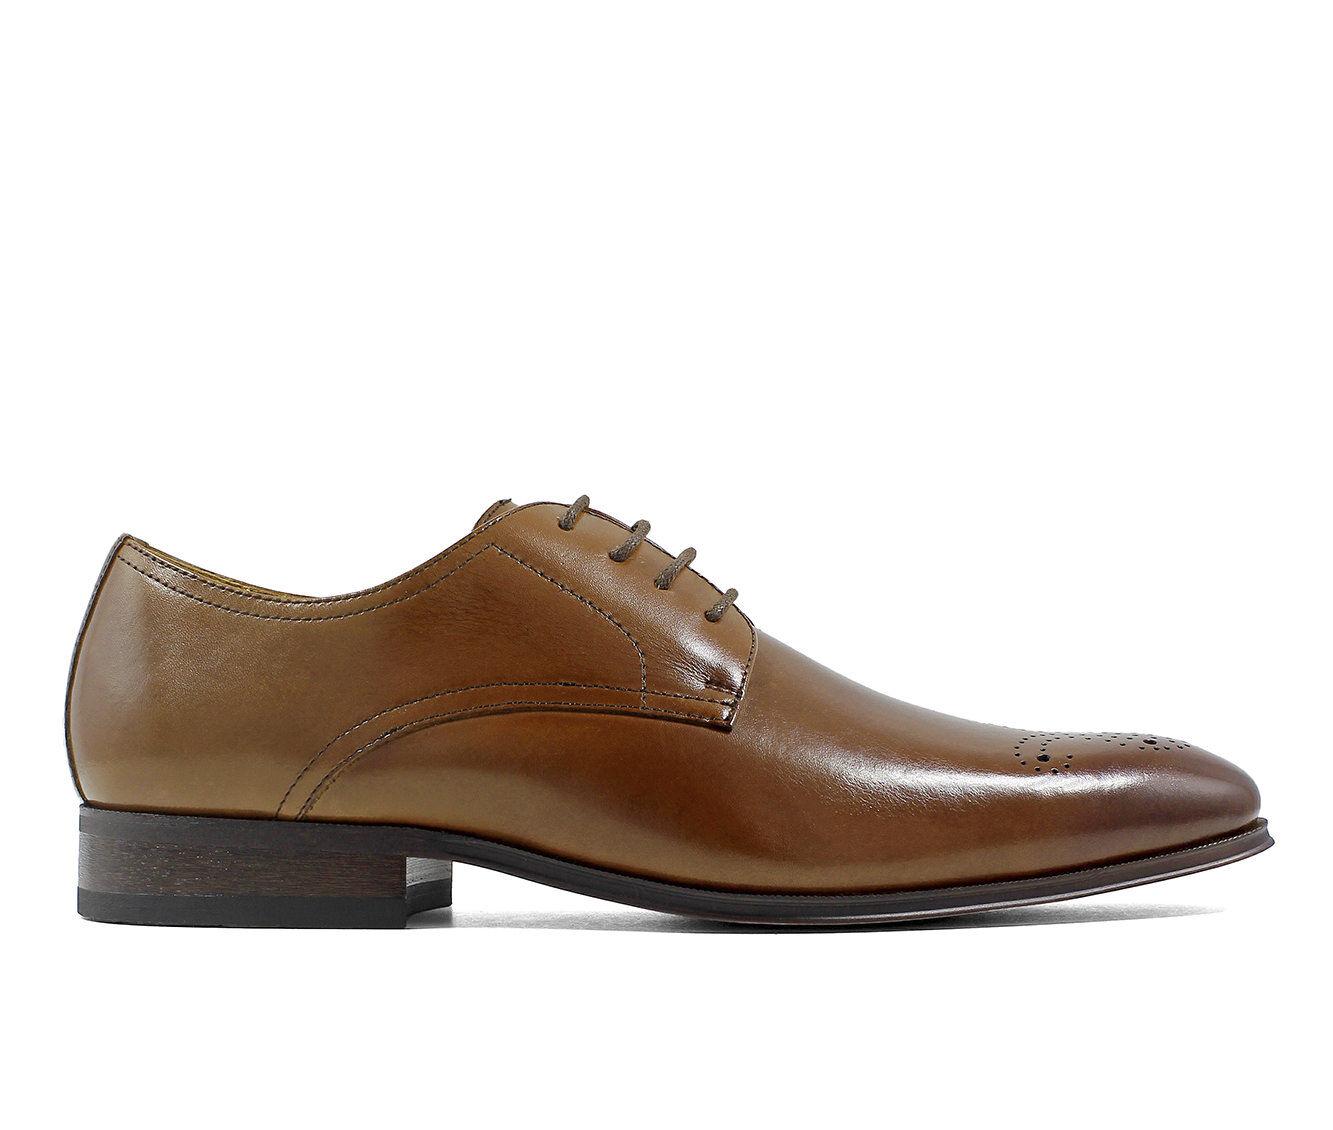 Men's Florsheim Corbetta Perforated Oxford Dress Shoes Scotch